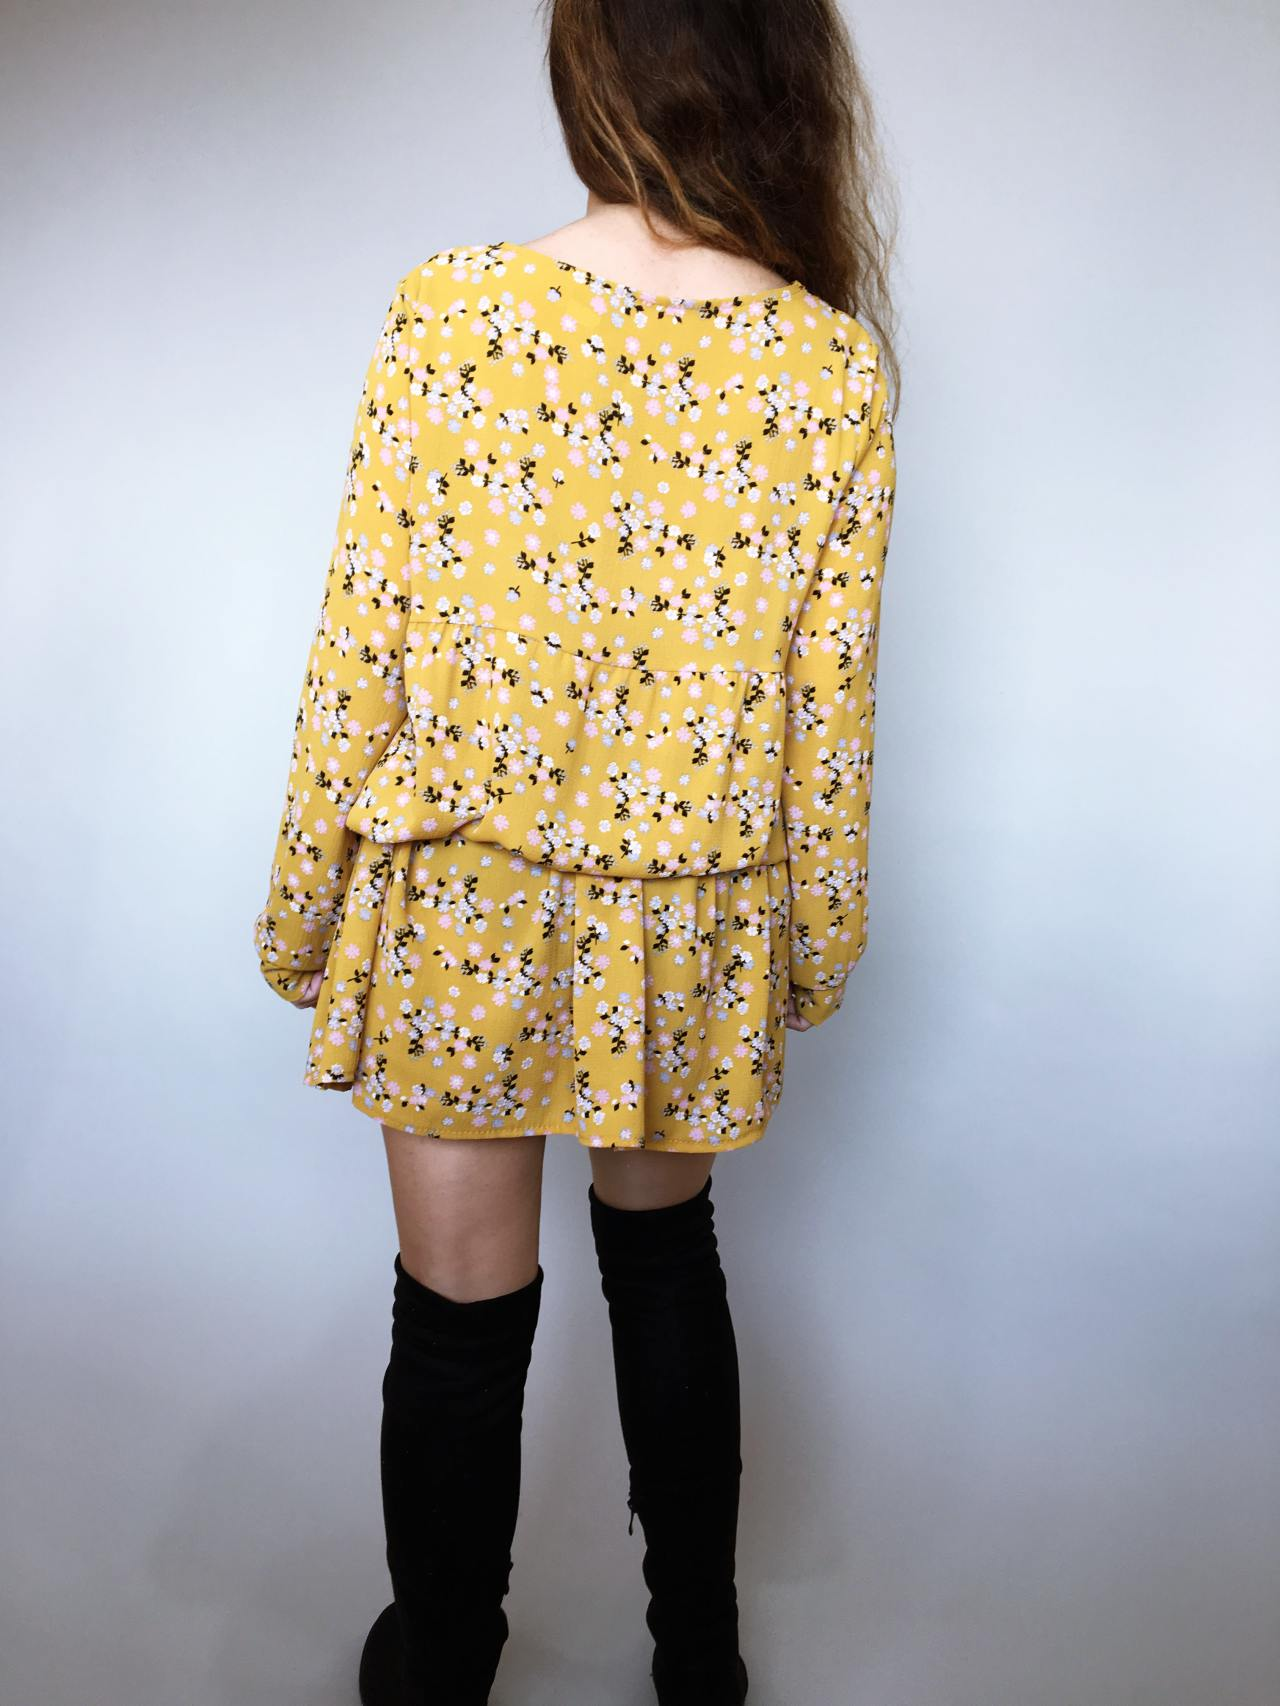 Šaty Lucy žluté 04